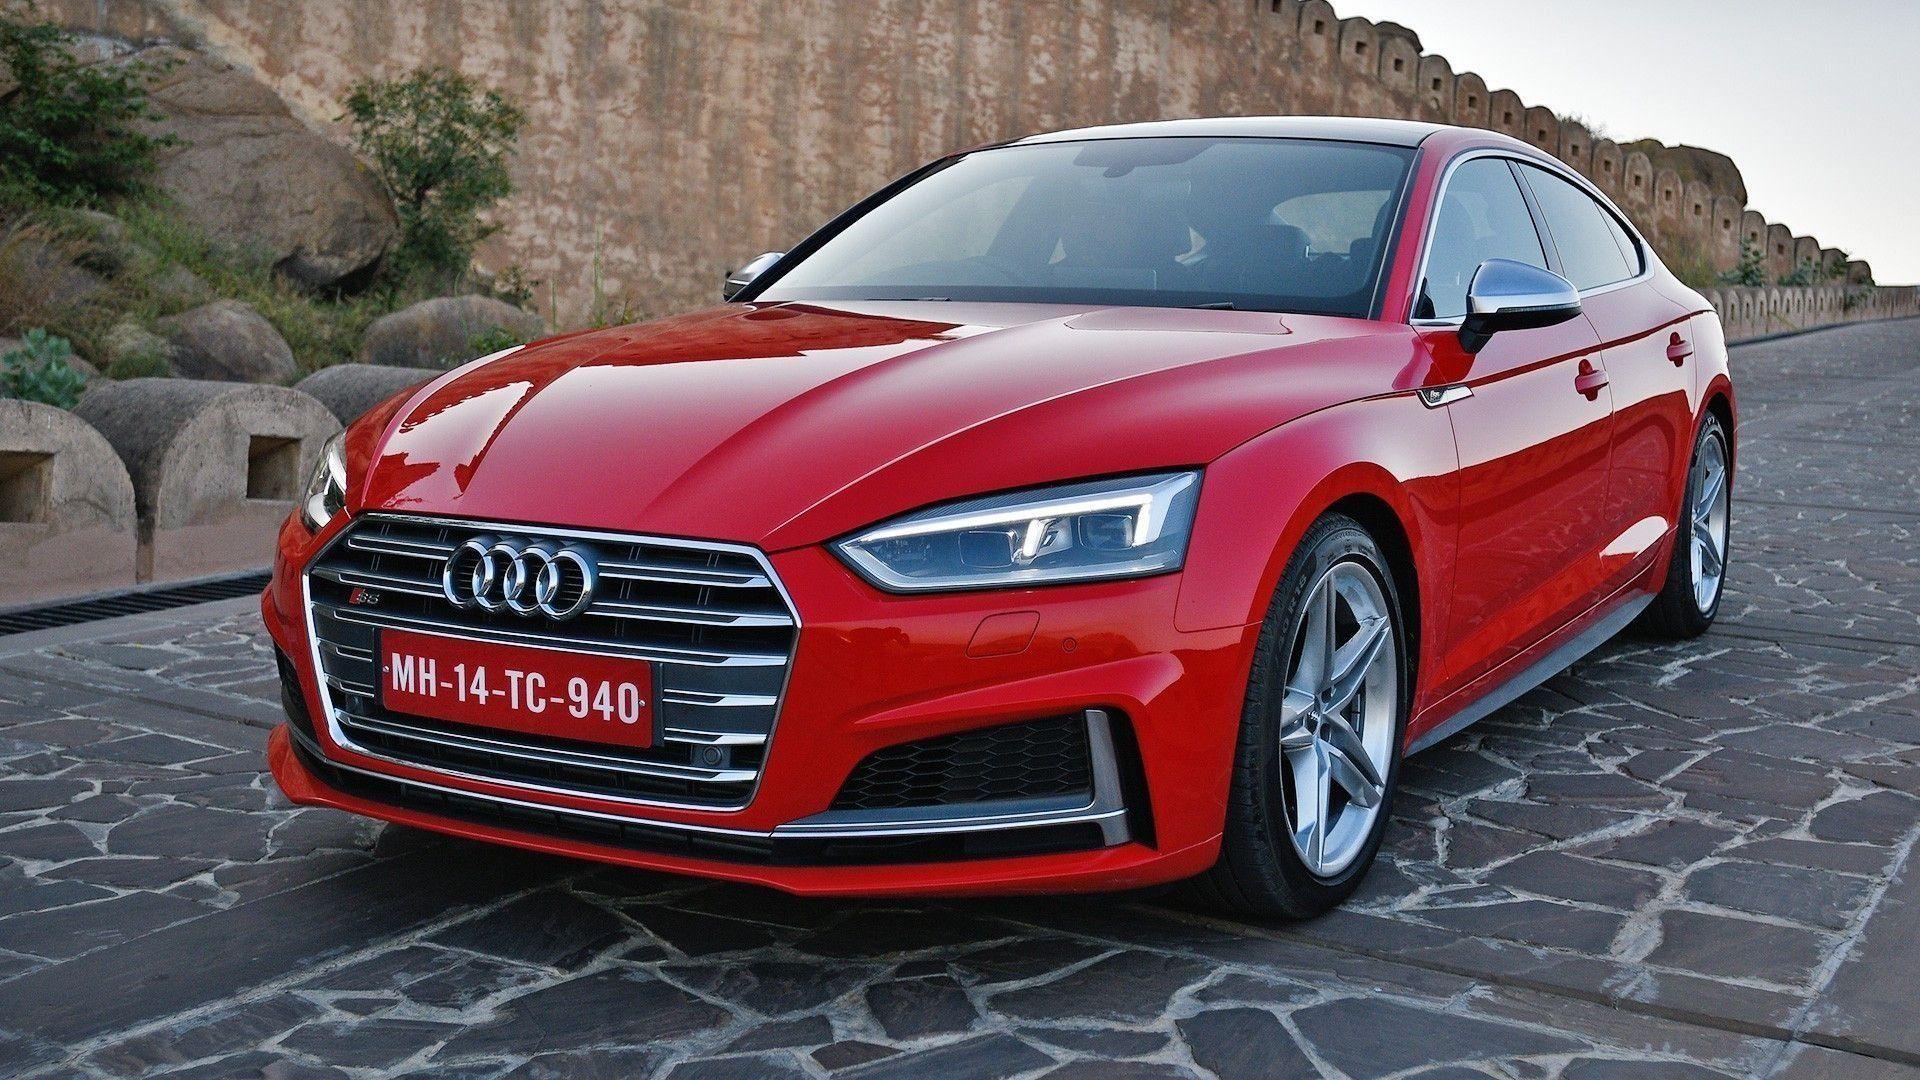 2021 Audi Rs5 Tdi Price And Review In 2020 Audi S5 Audi Audi Rs5